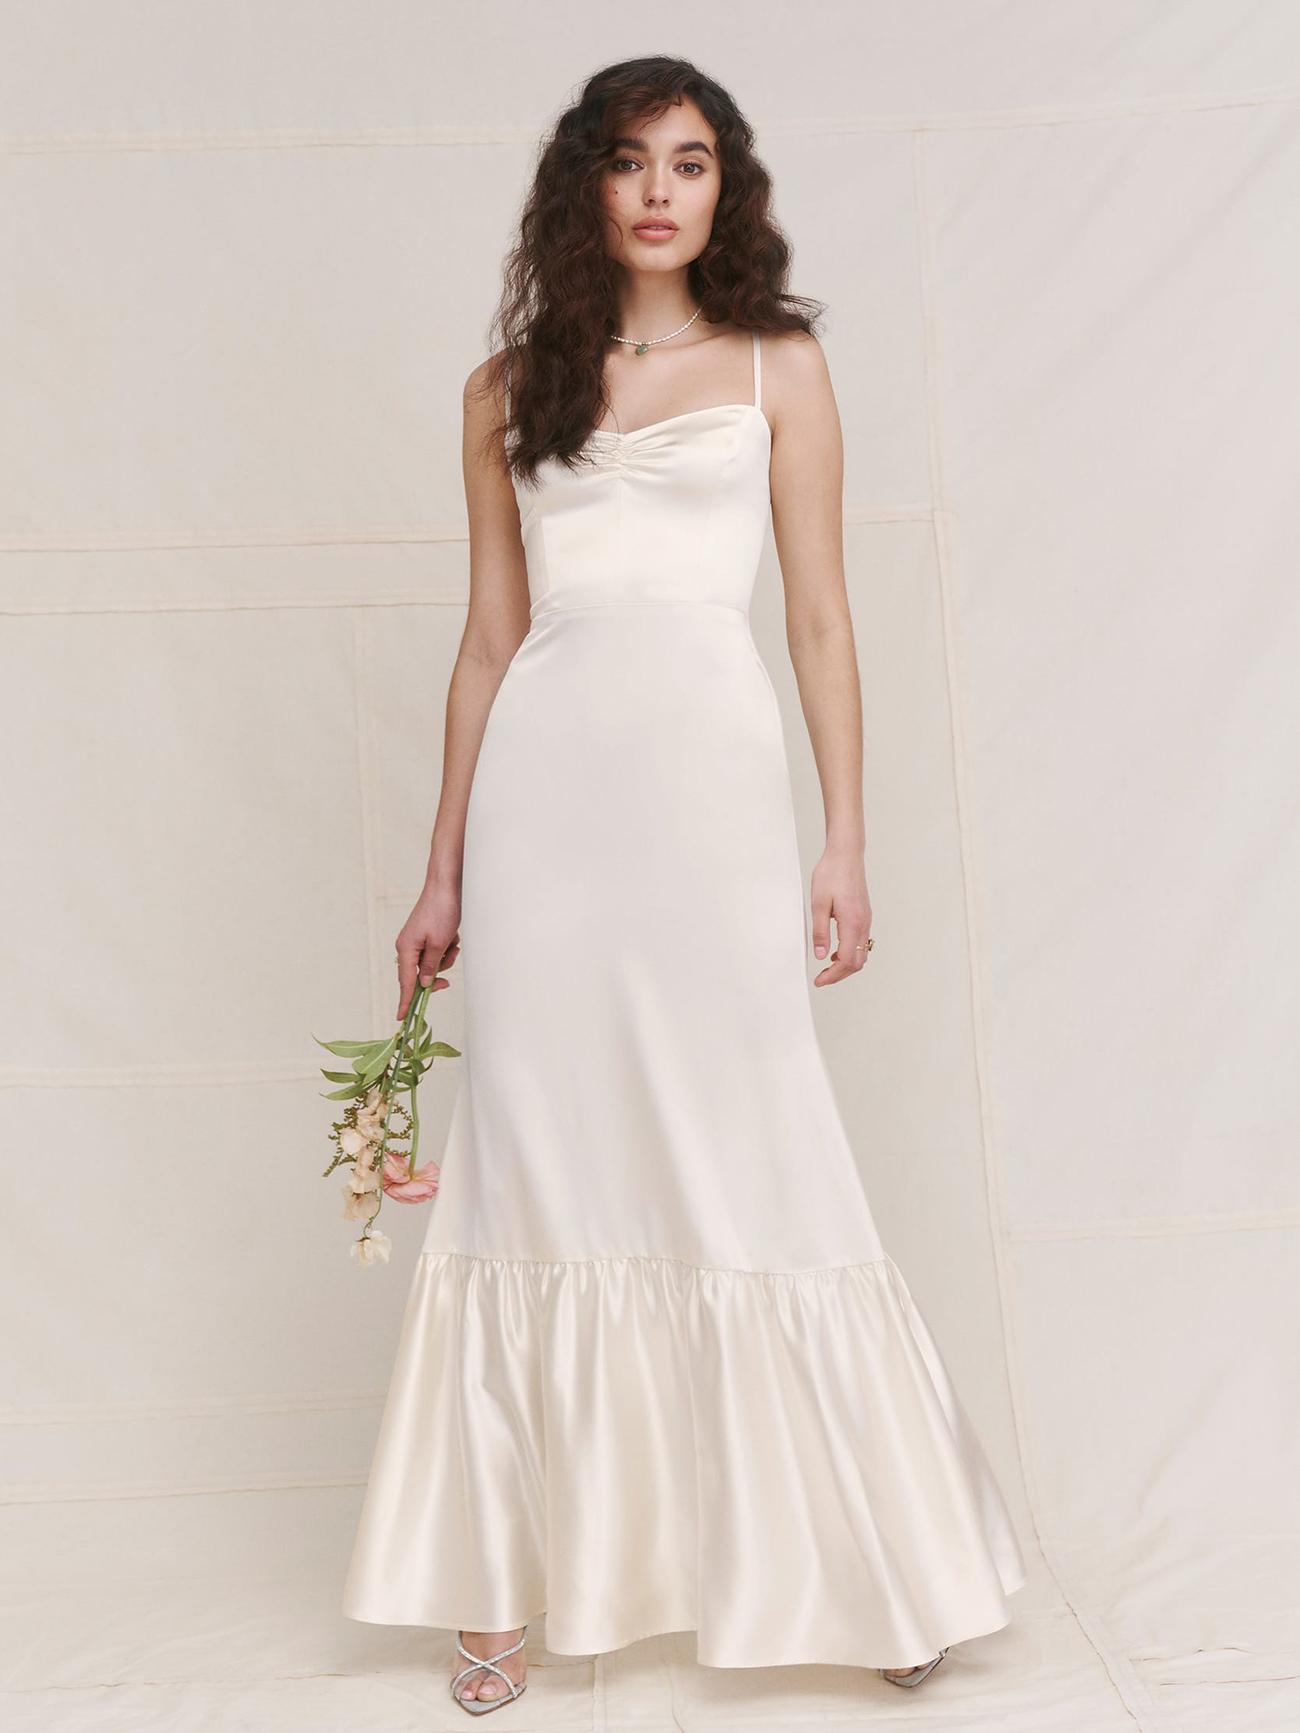 Venetia Dress by Reformation